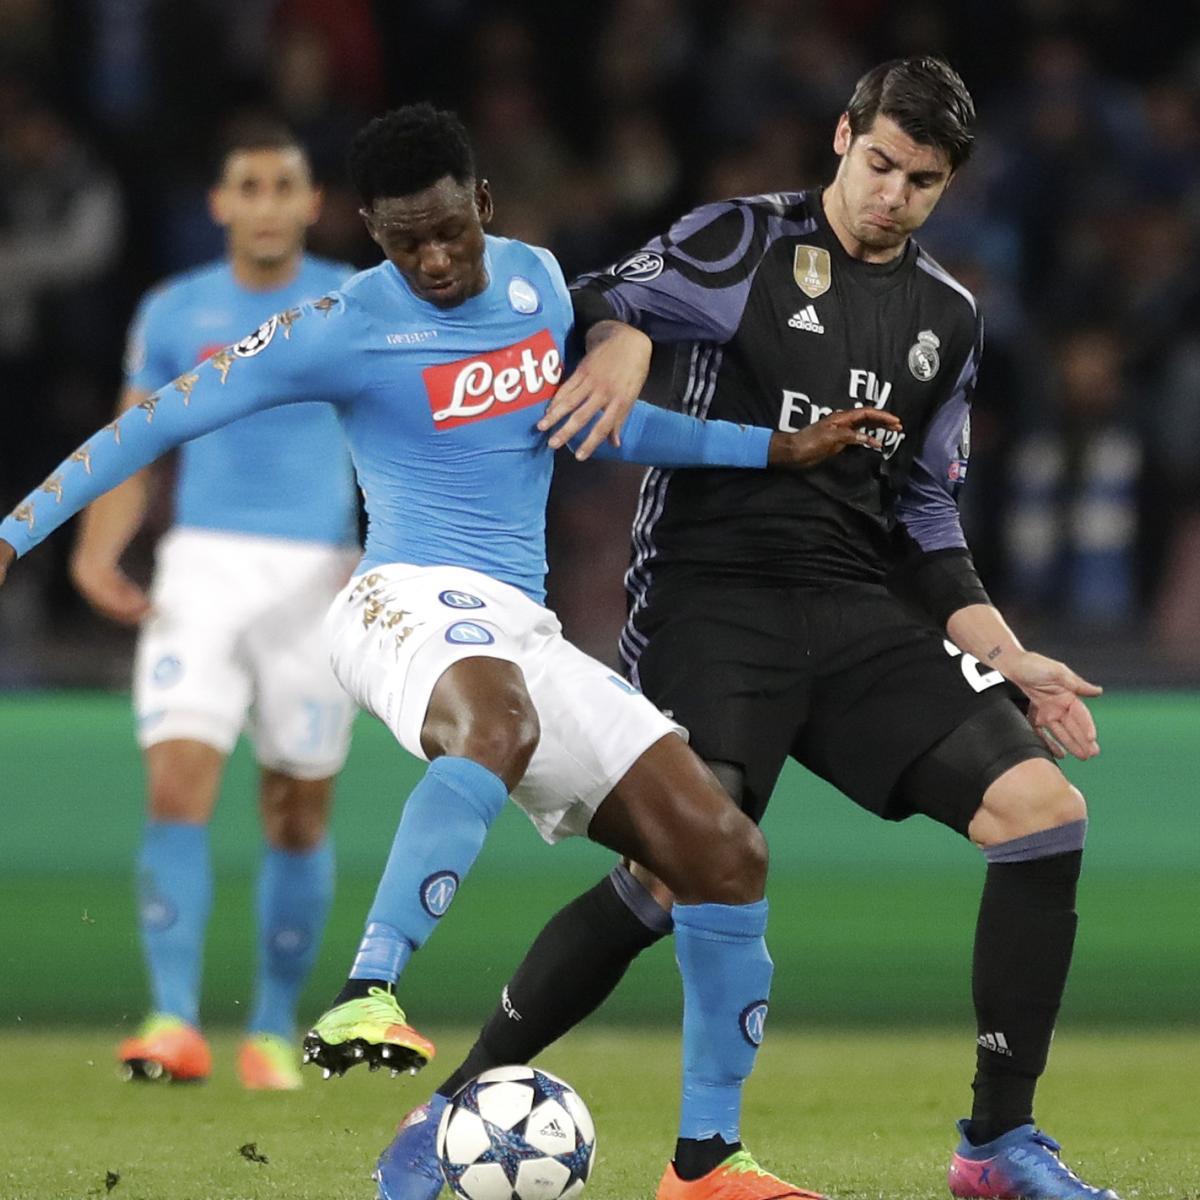 Liverpool Transfer News: Latest on Amadou Diawara Amid Tottenham Rumours